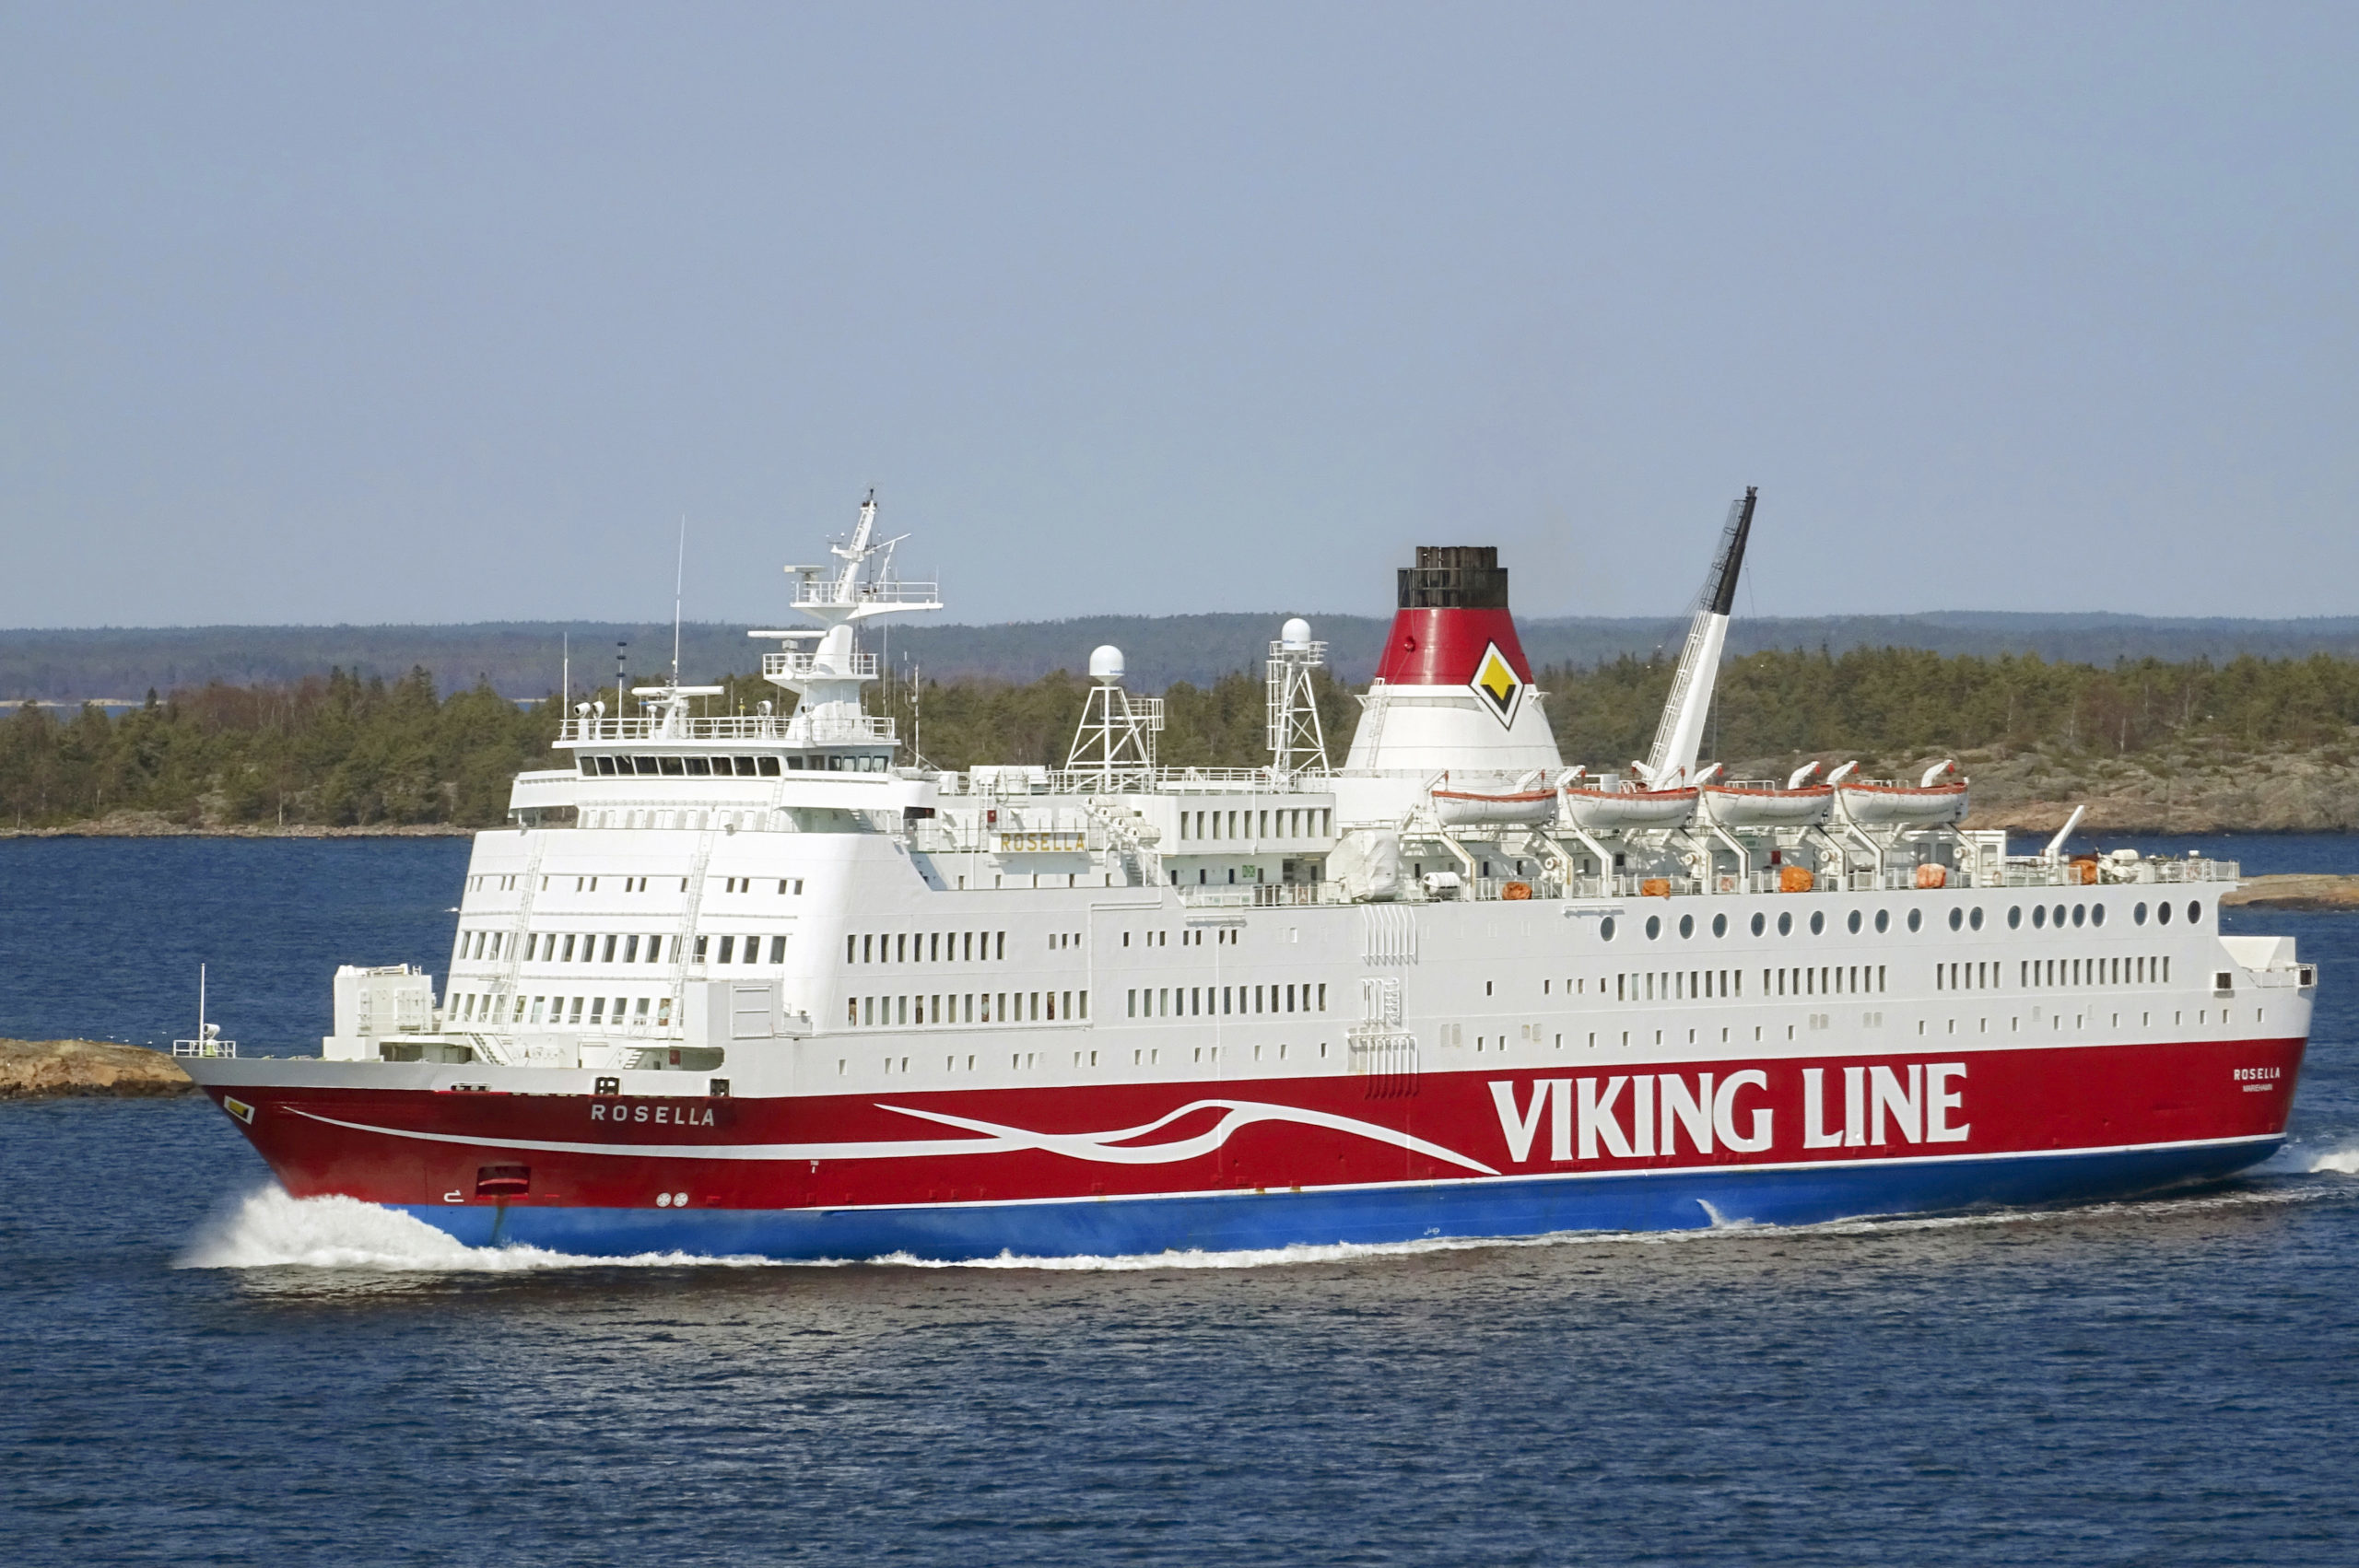 Rosella Viking Line